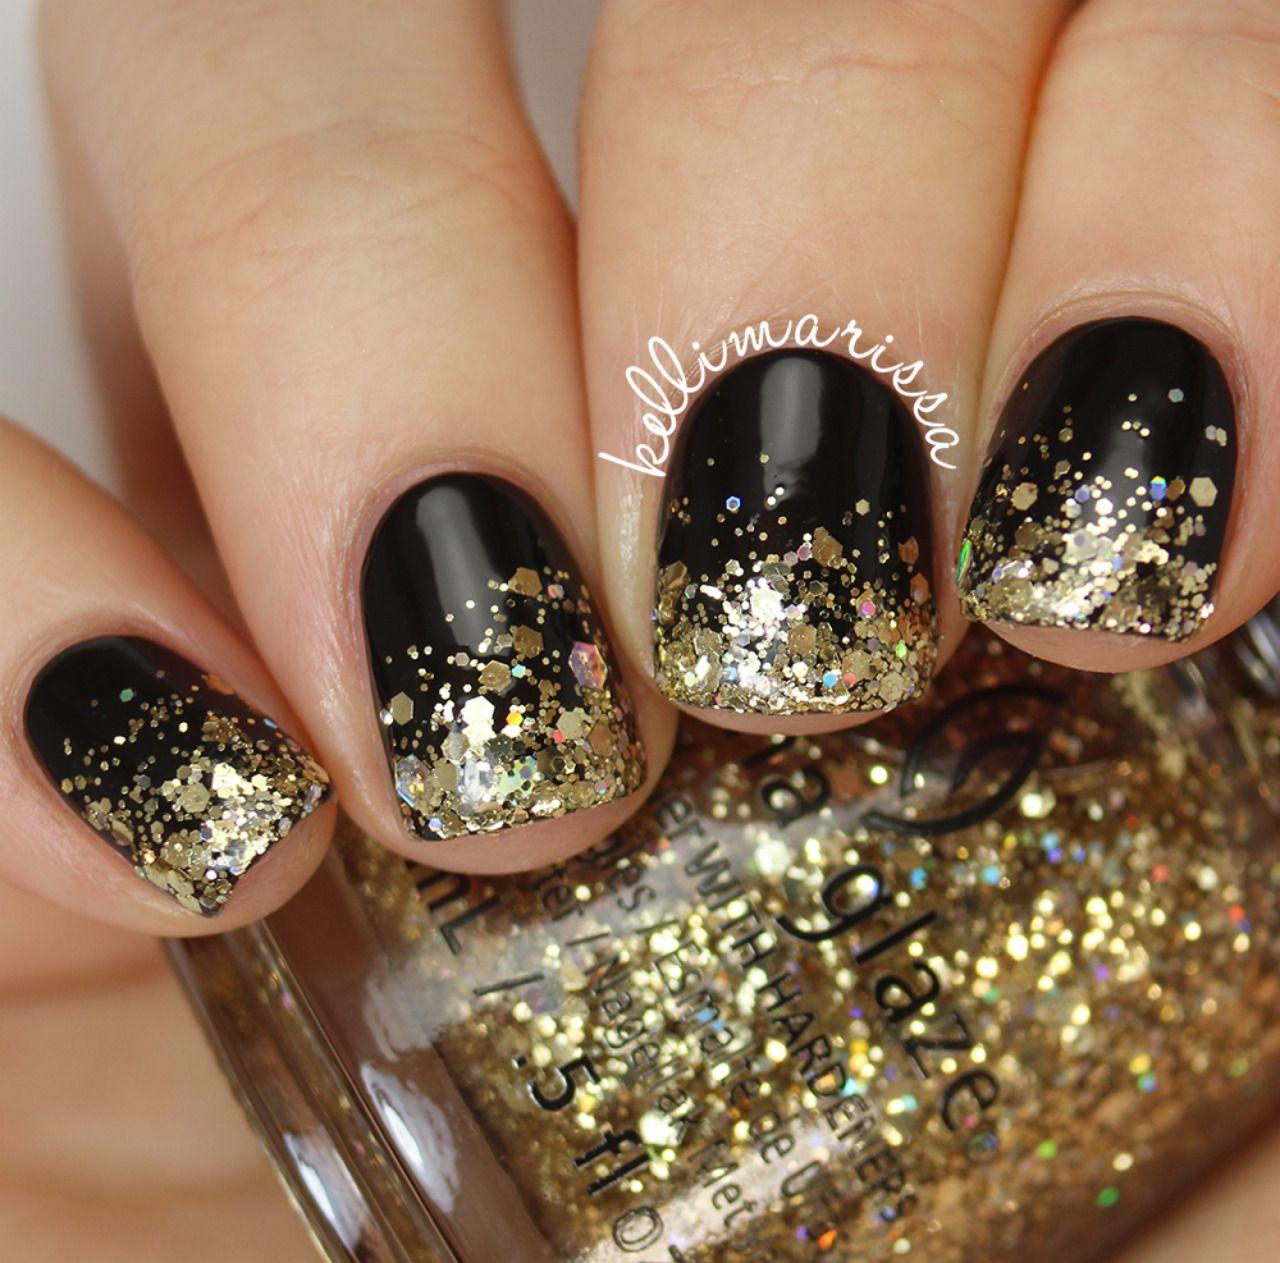 new years eve nails | Tumblr | Nail Art Community Pins | Pinterest ...